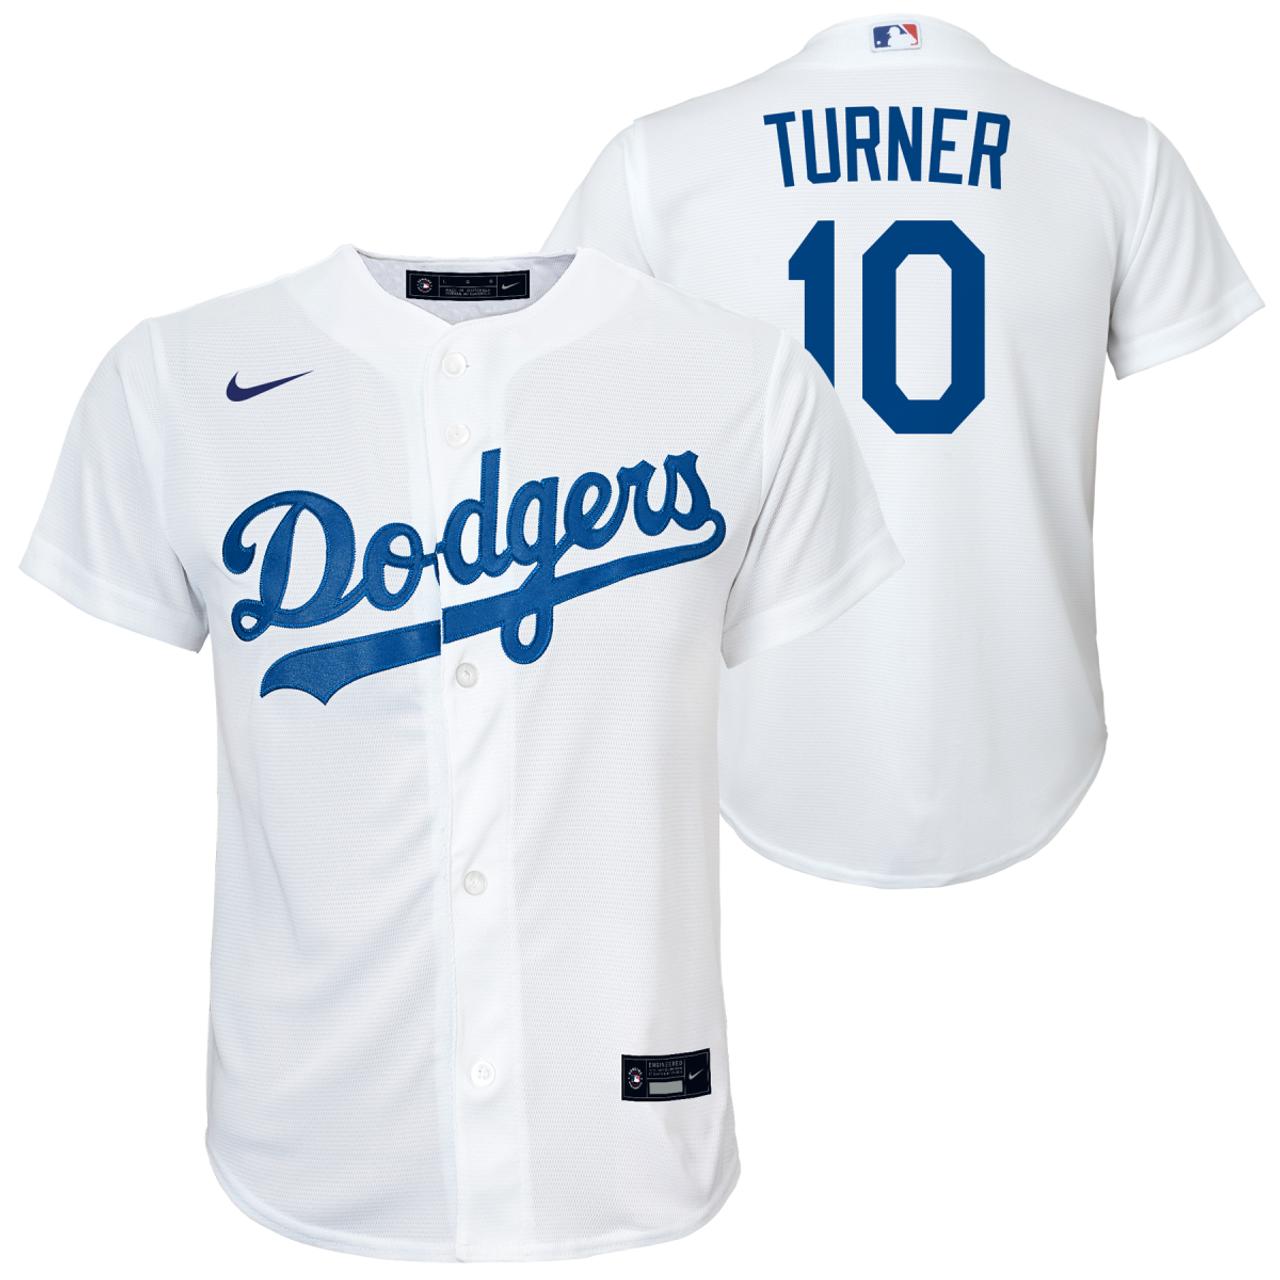 Justin Turner Jersey - LA Dodgers Replica Adult Home Jersey